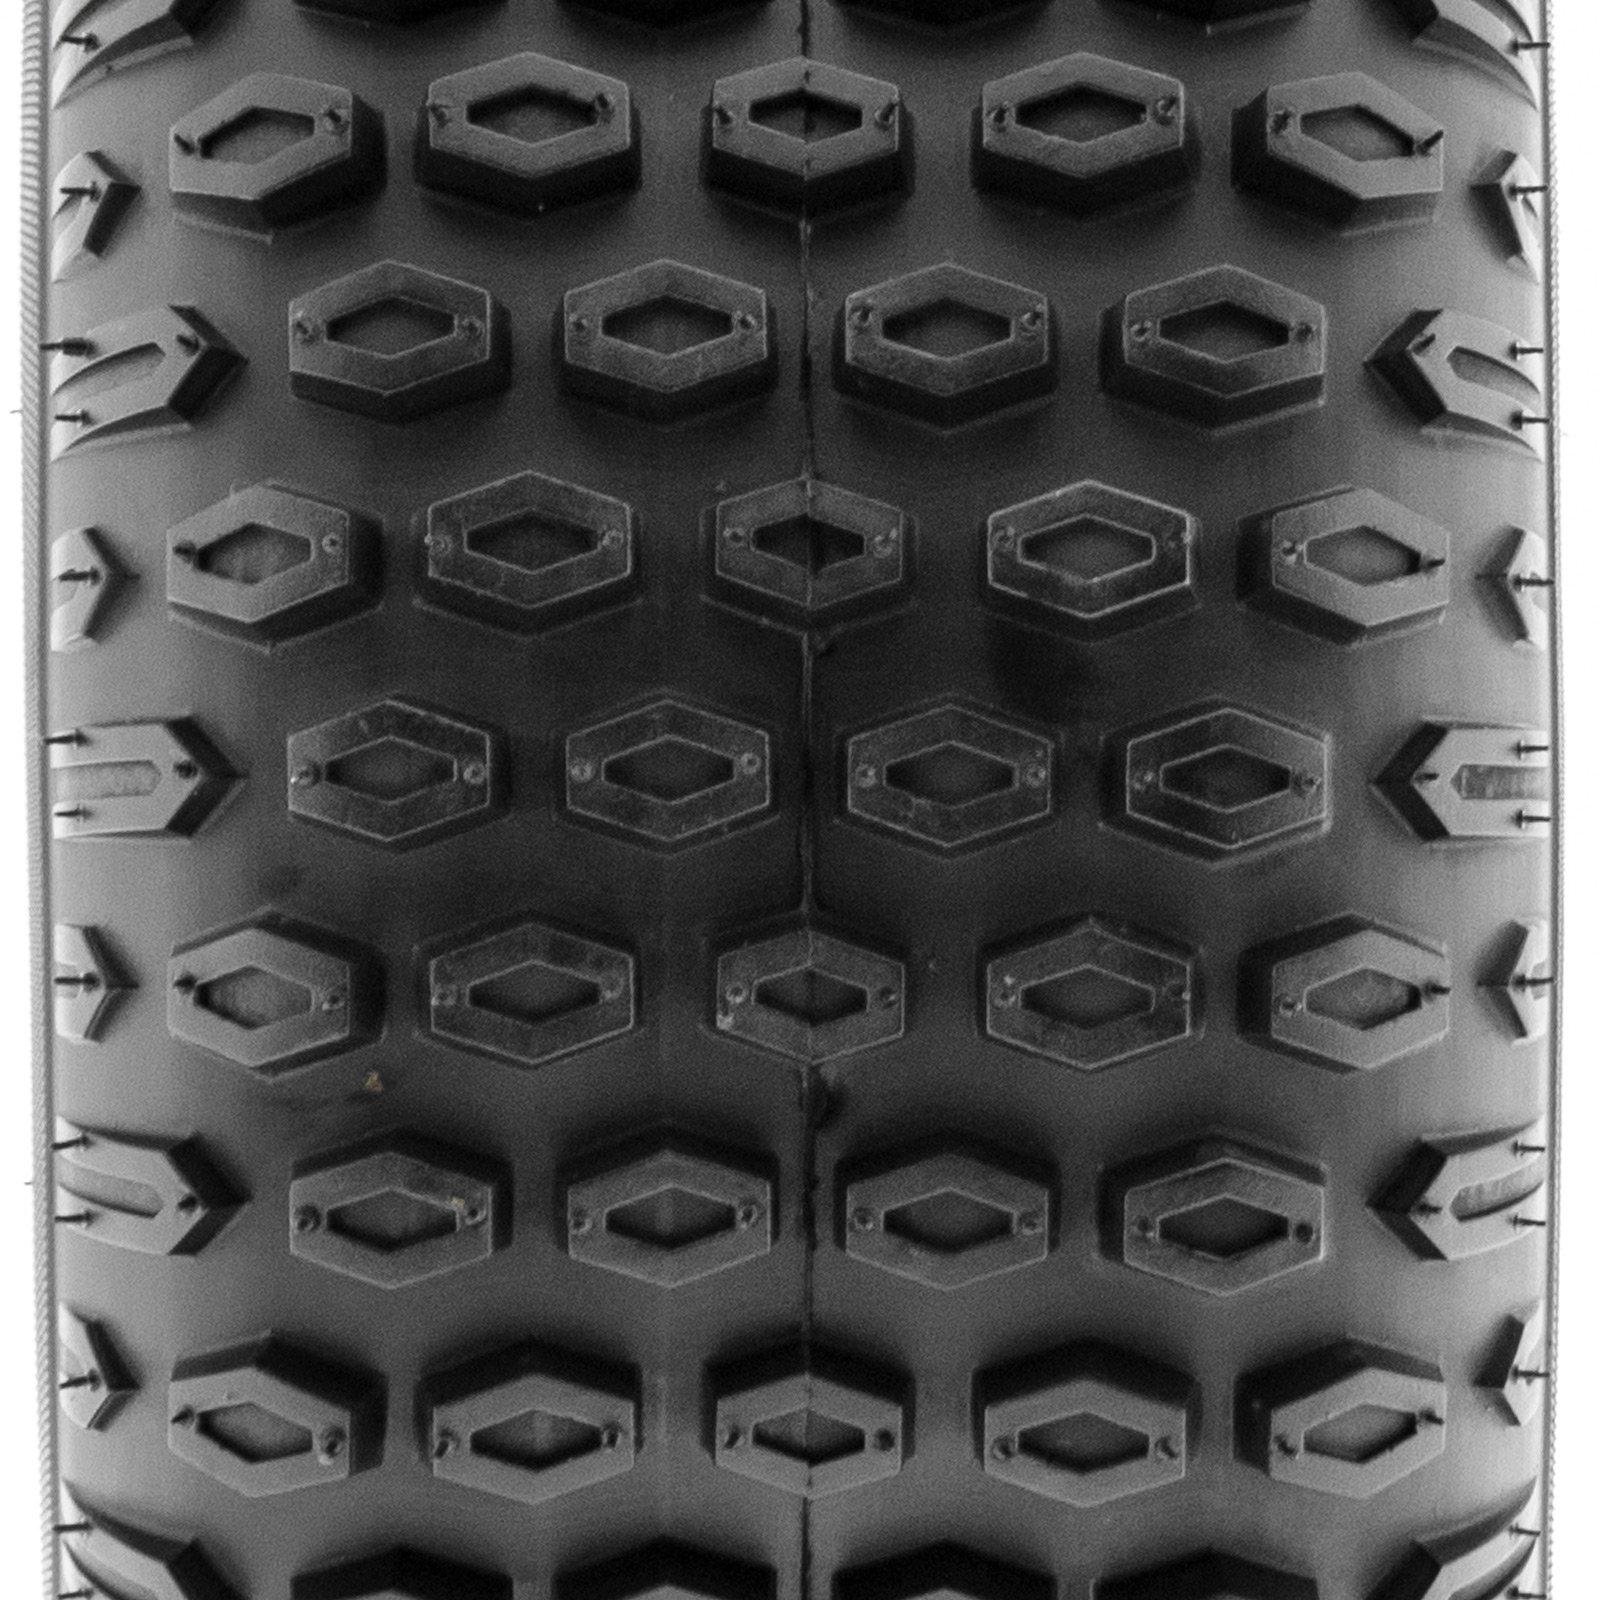 SunF Quad ATV Sport Tires 16x8-7 16x8x7 4 PR A012 (Full set of 4) by SunF (Image #7)